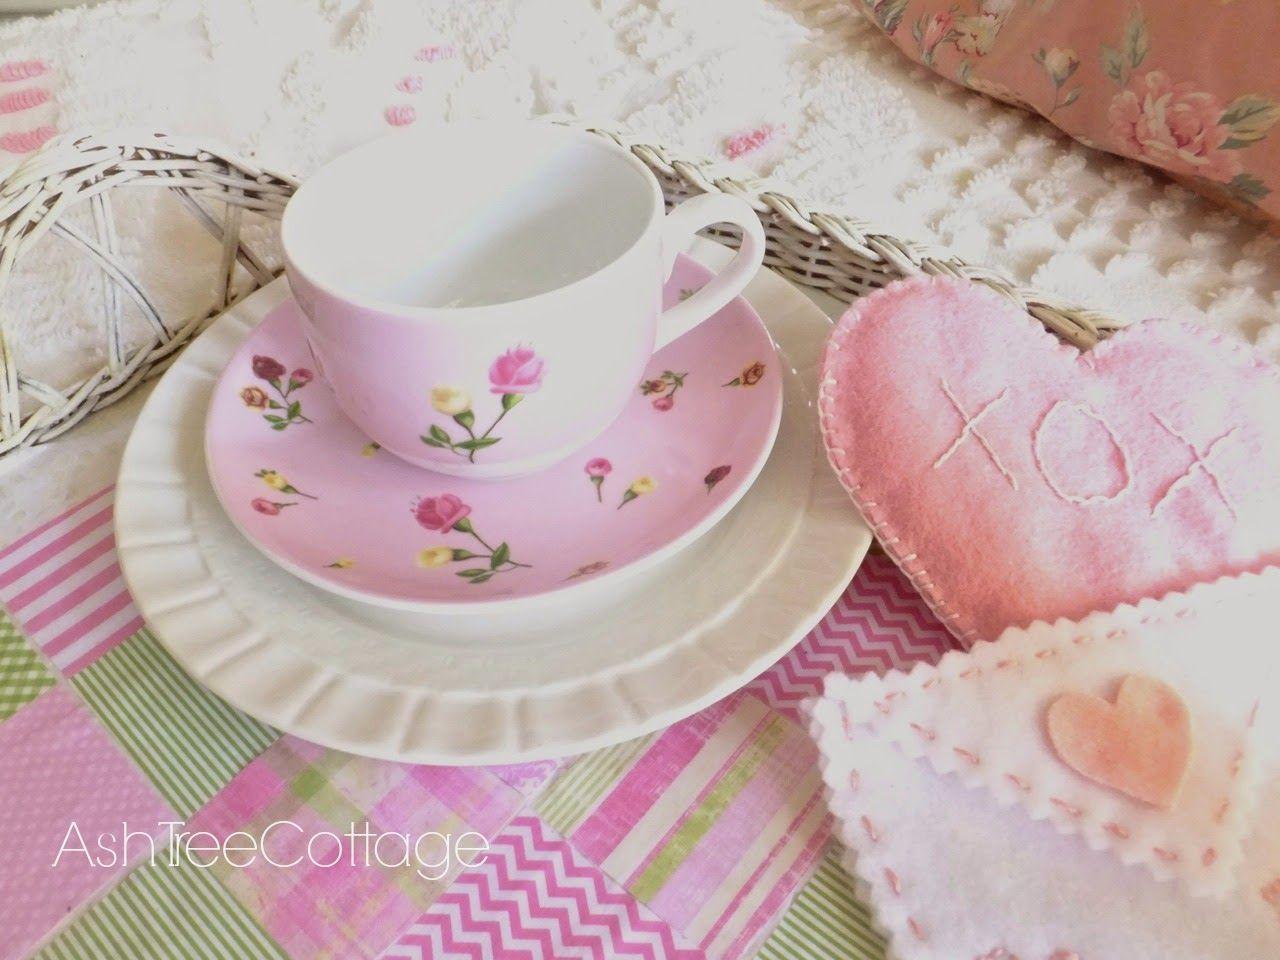 Ash Tree Cottage: Valentine Breakfast Tray